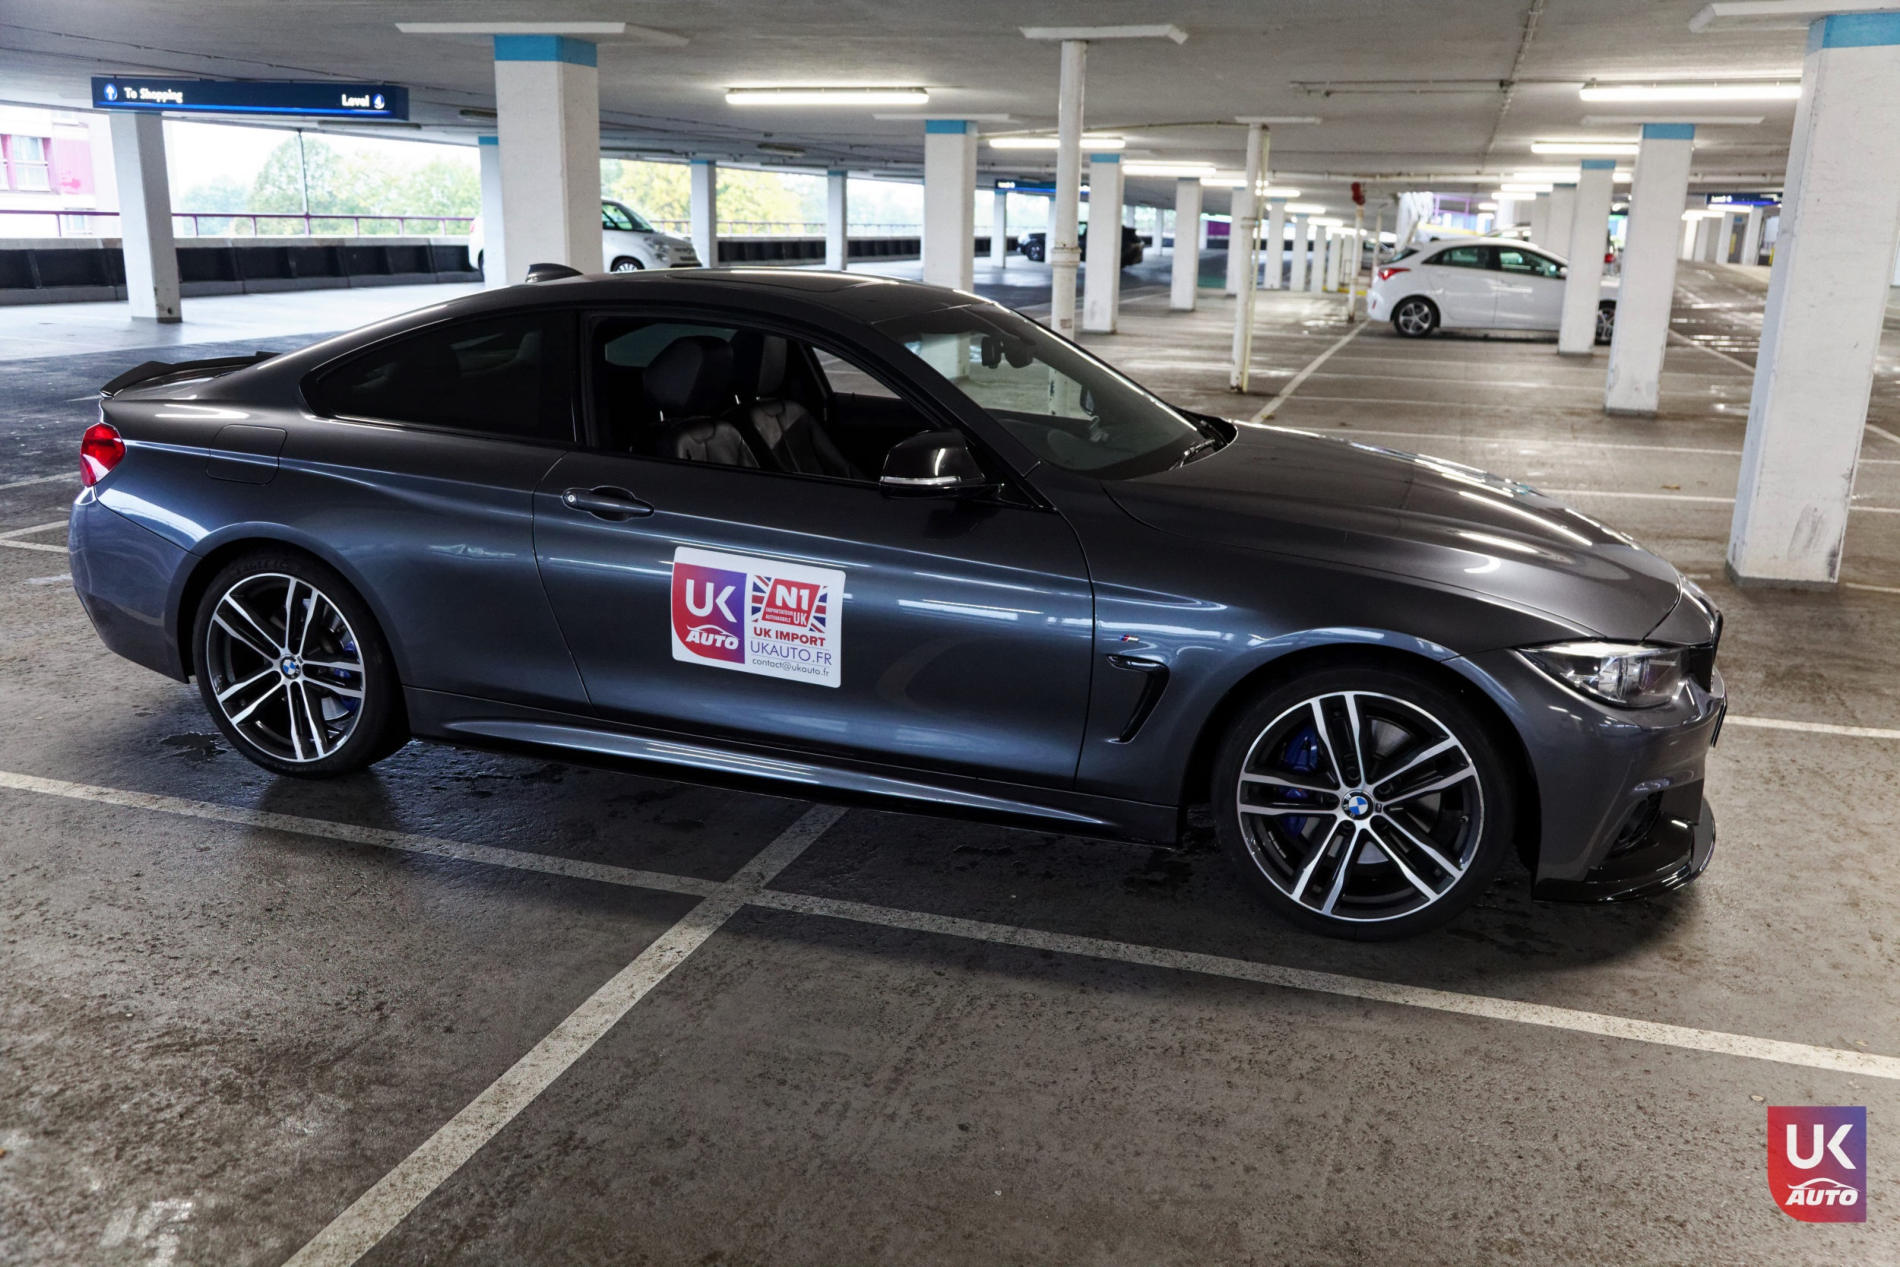 IMPORTATION BMW GRANDE BRETAGNE BMW 420D FACELIFT PAR UKAUTO SITE OCCASION UK FELICITATION A MATHIEU PAR VOTRE MANDATAIRE1 - IMPORTATION BMW GRANDE BRETAGNE BMW 420D FACELIFT PAR UKAUTO SITE OCCASION UK FELICITATION A MATHIEU PAR VOTRE MANDATAIRE